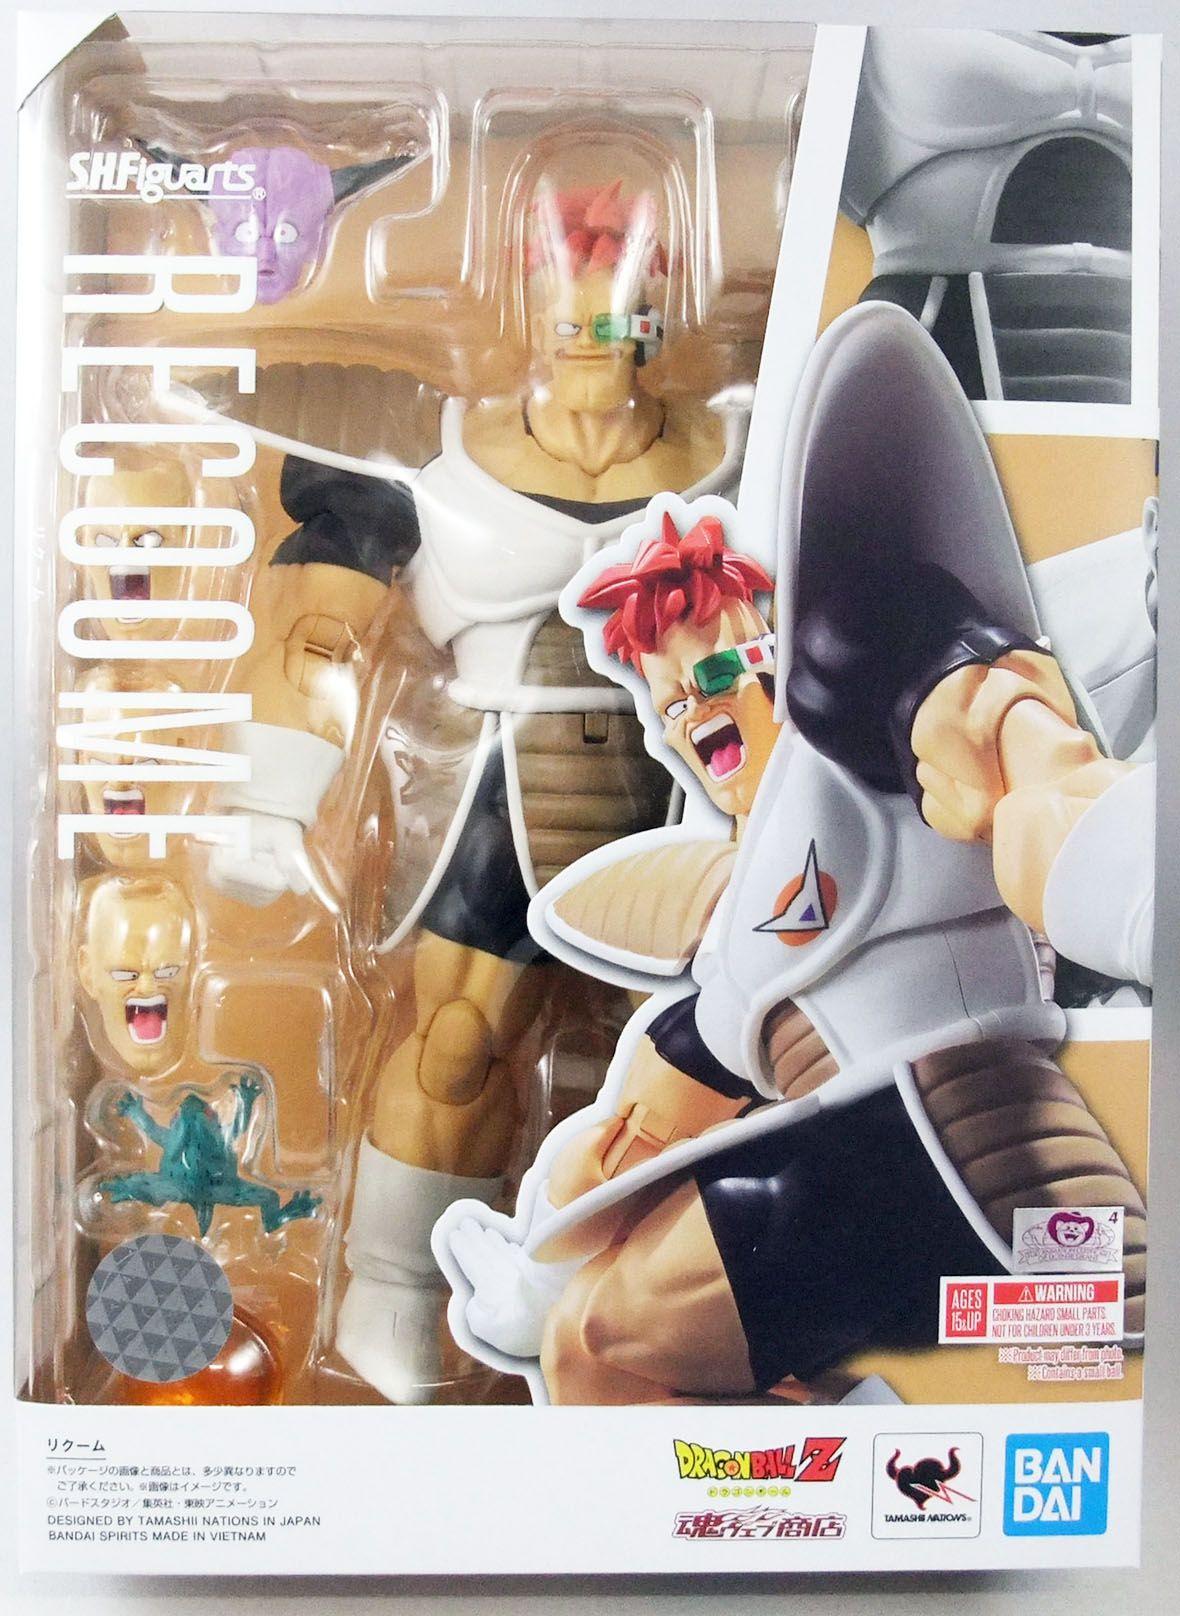 Dragonball Z - Bandai S.H.Figuarts - Recoome